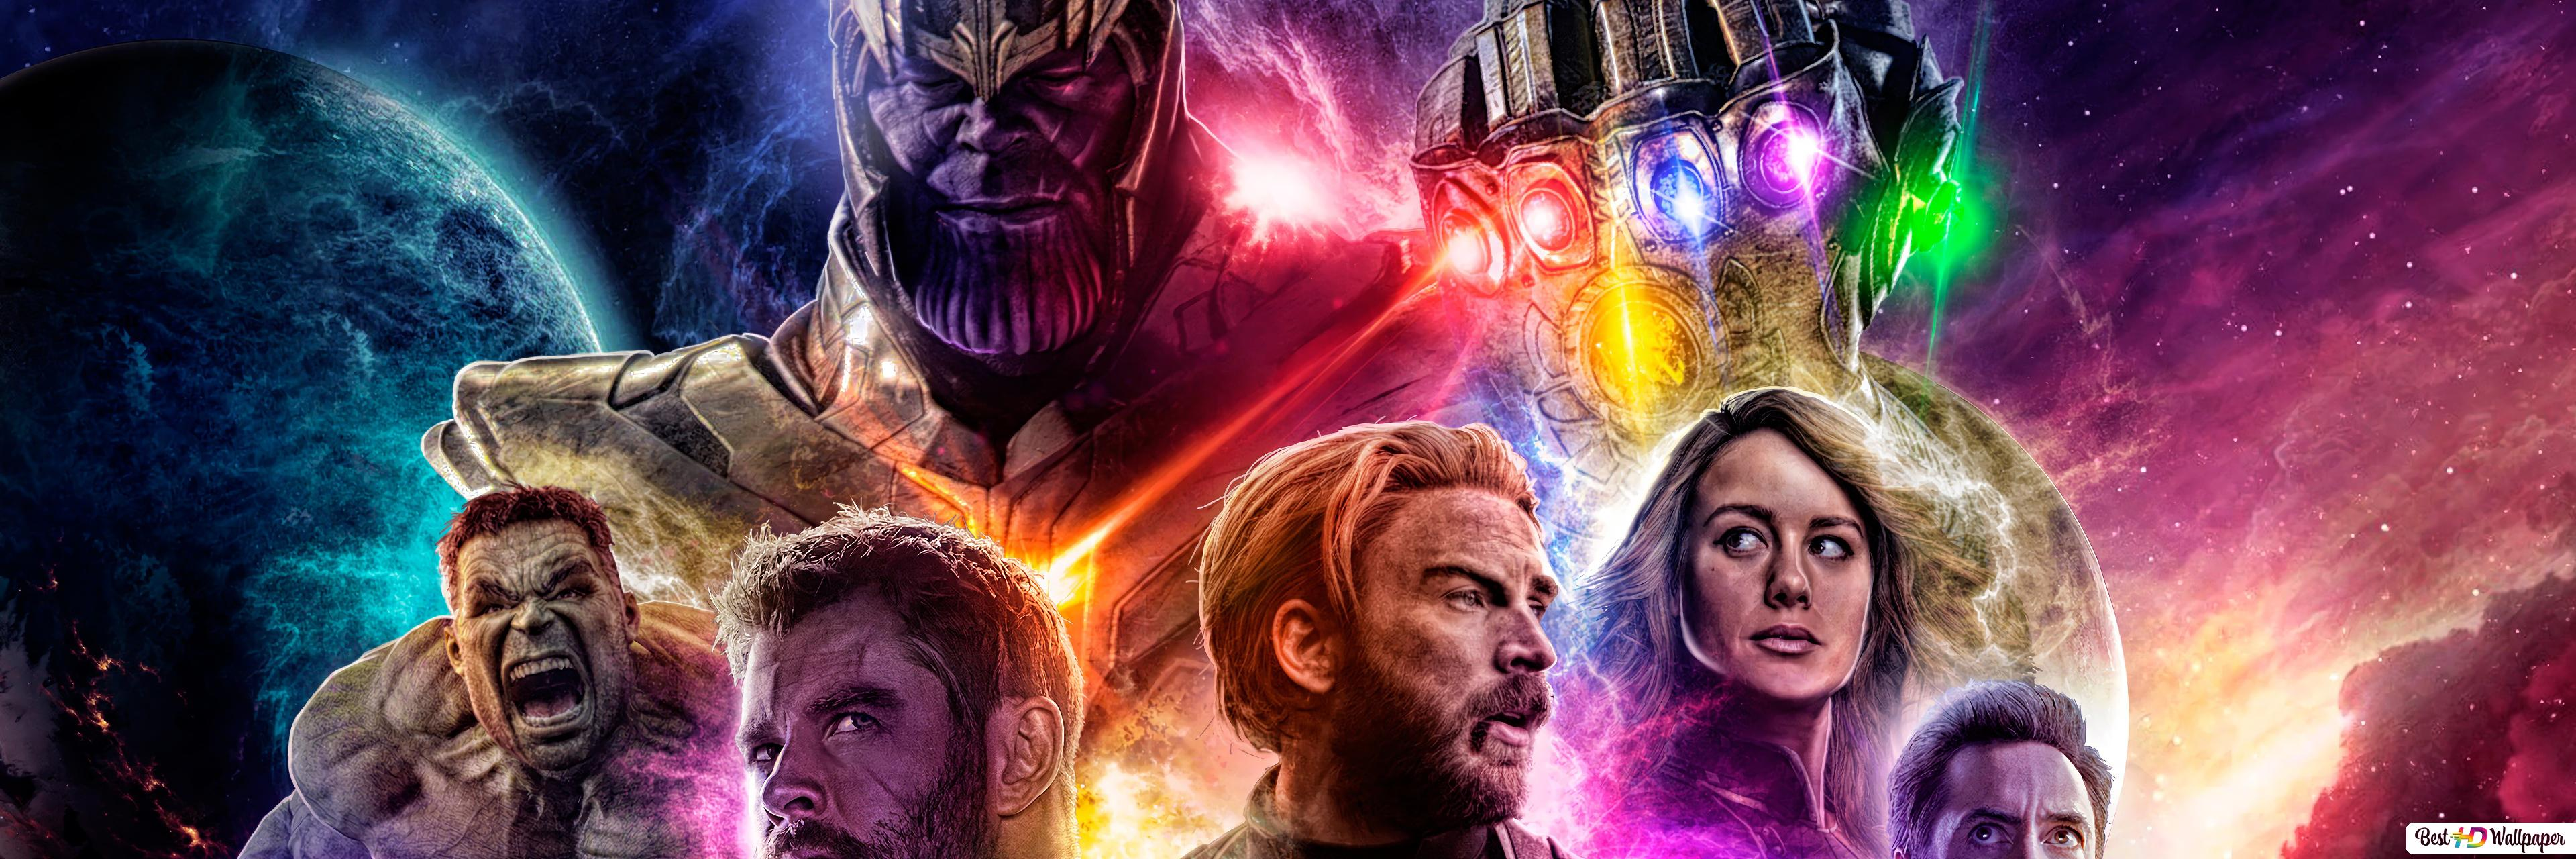 Avengers 4 Endgame Hd Wallpaper Download